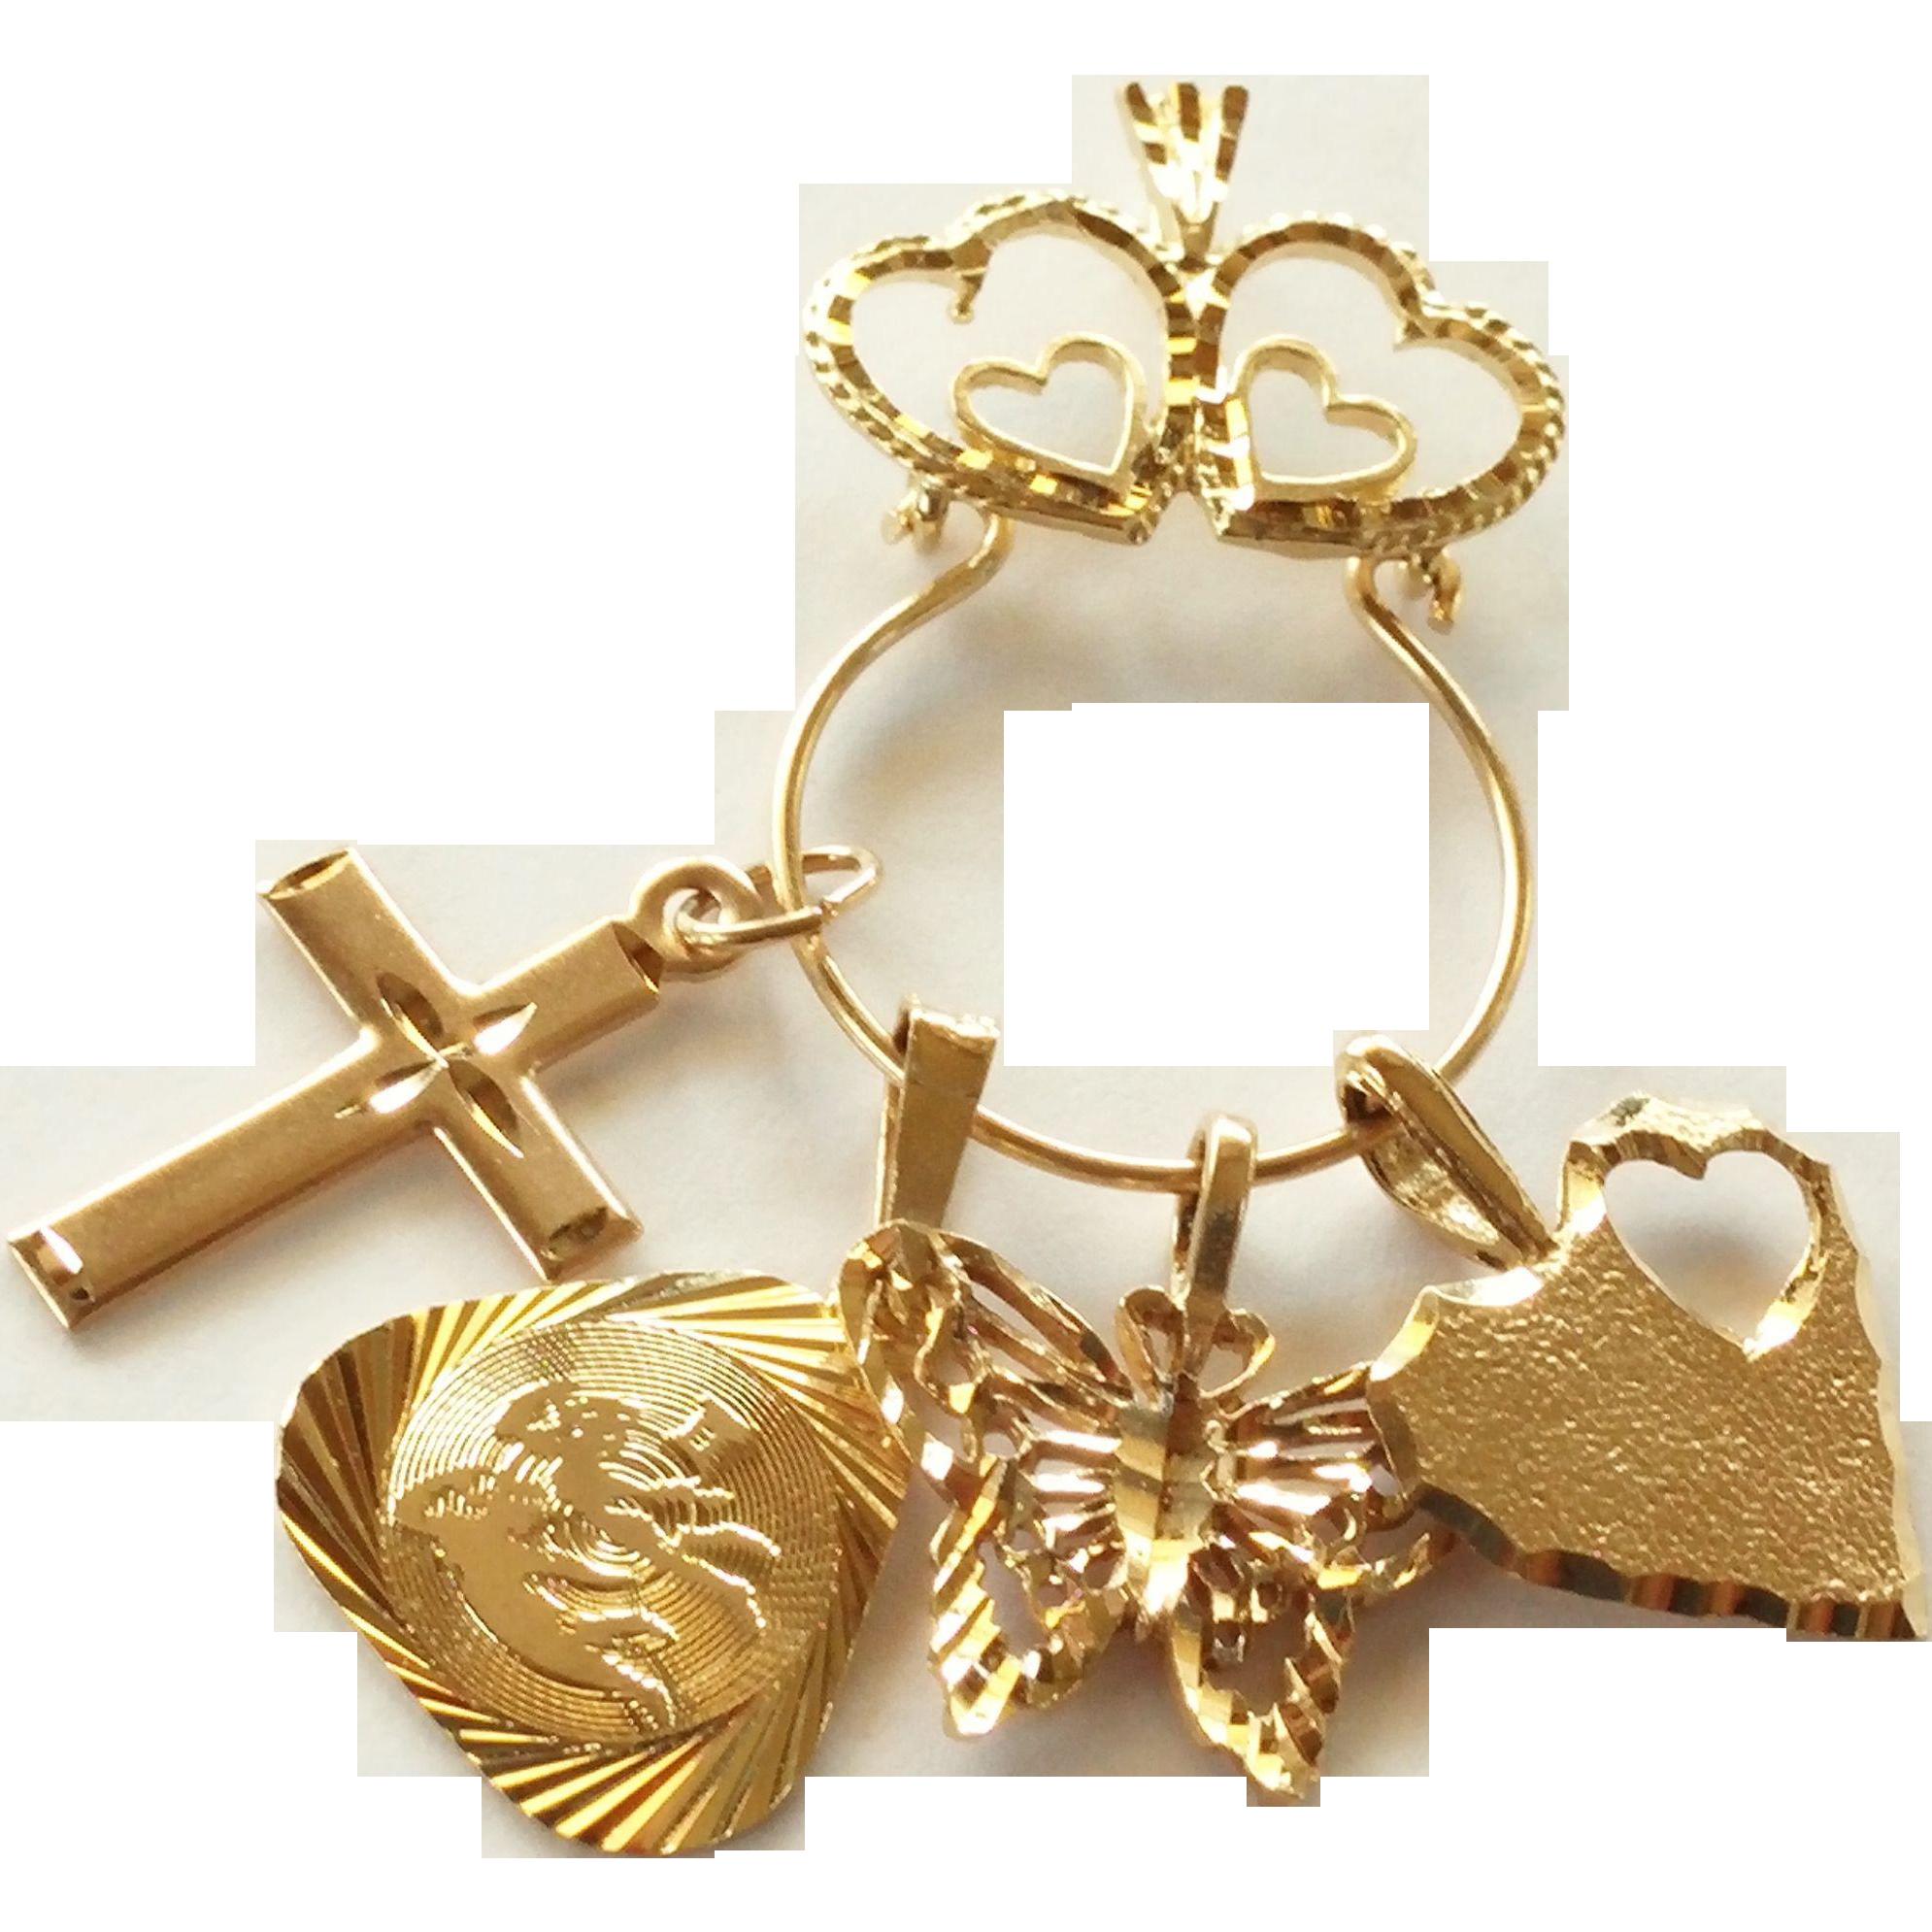 vintage 10k gold necklace charm holder pendant from